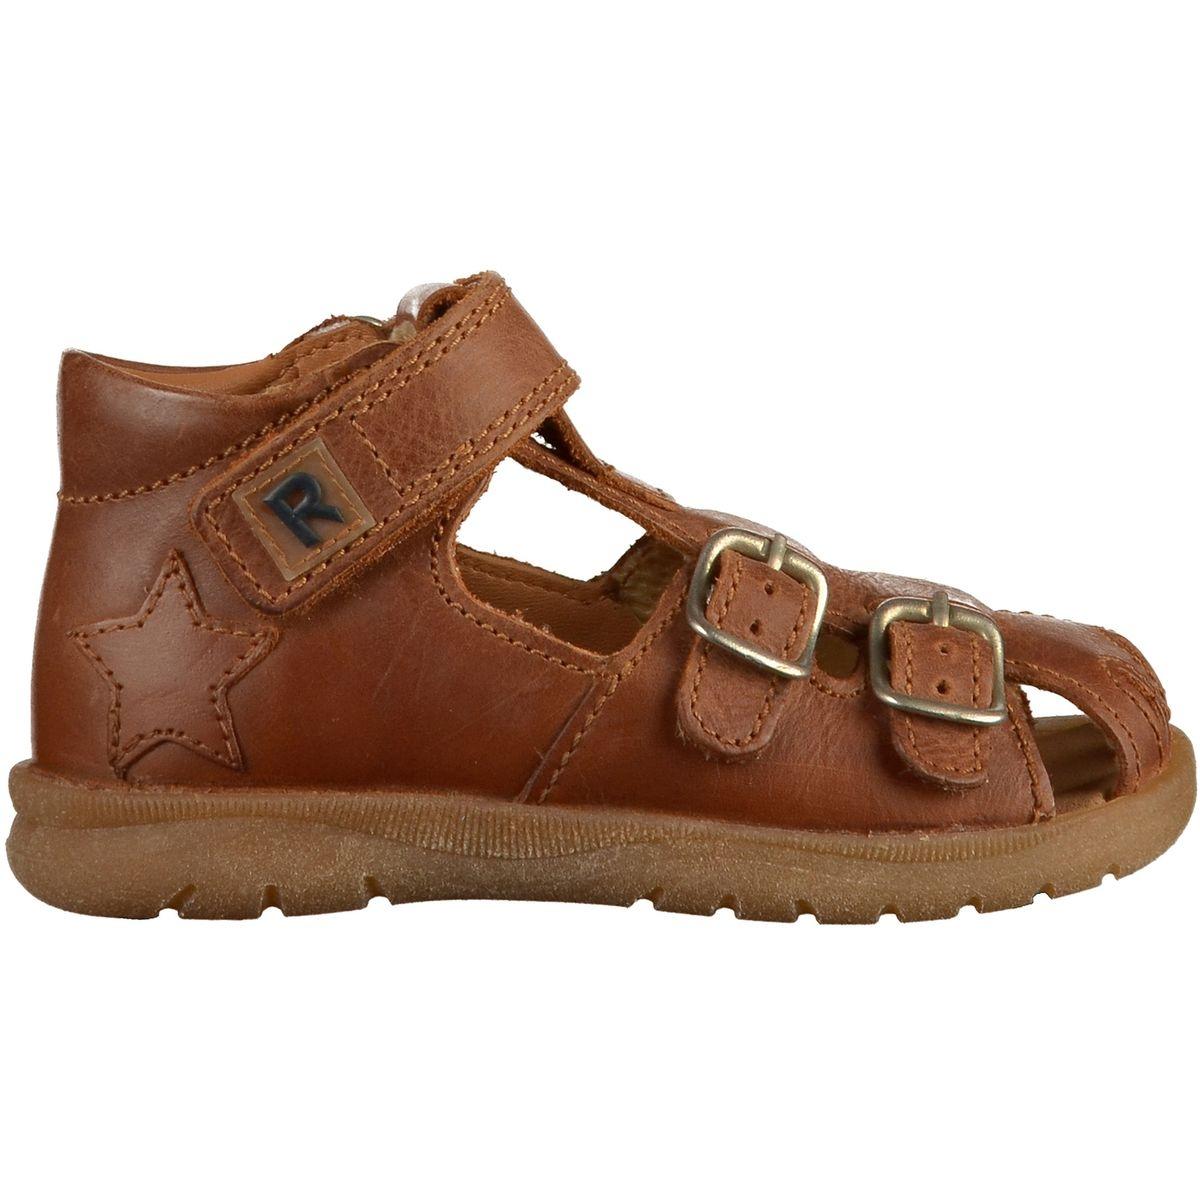 Sandales Cuir verni